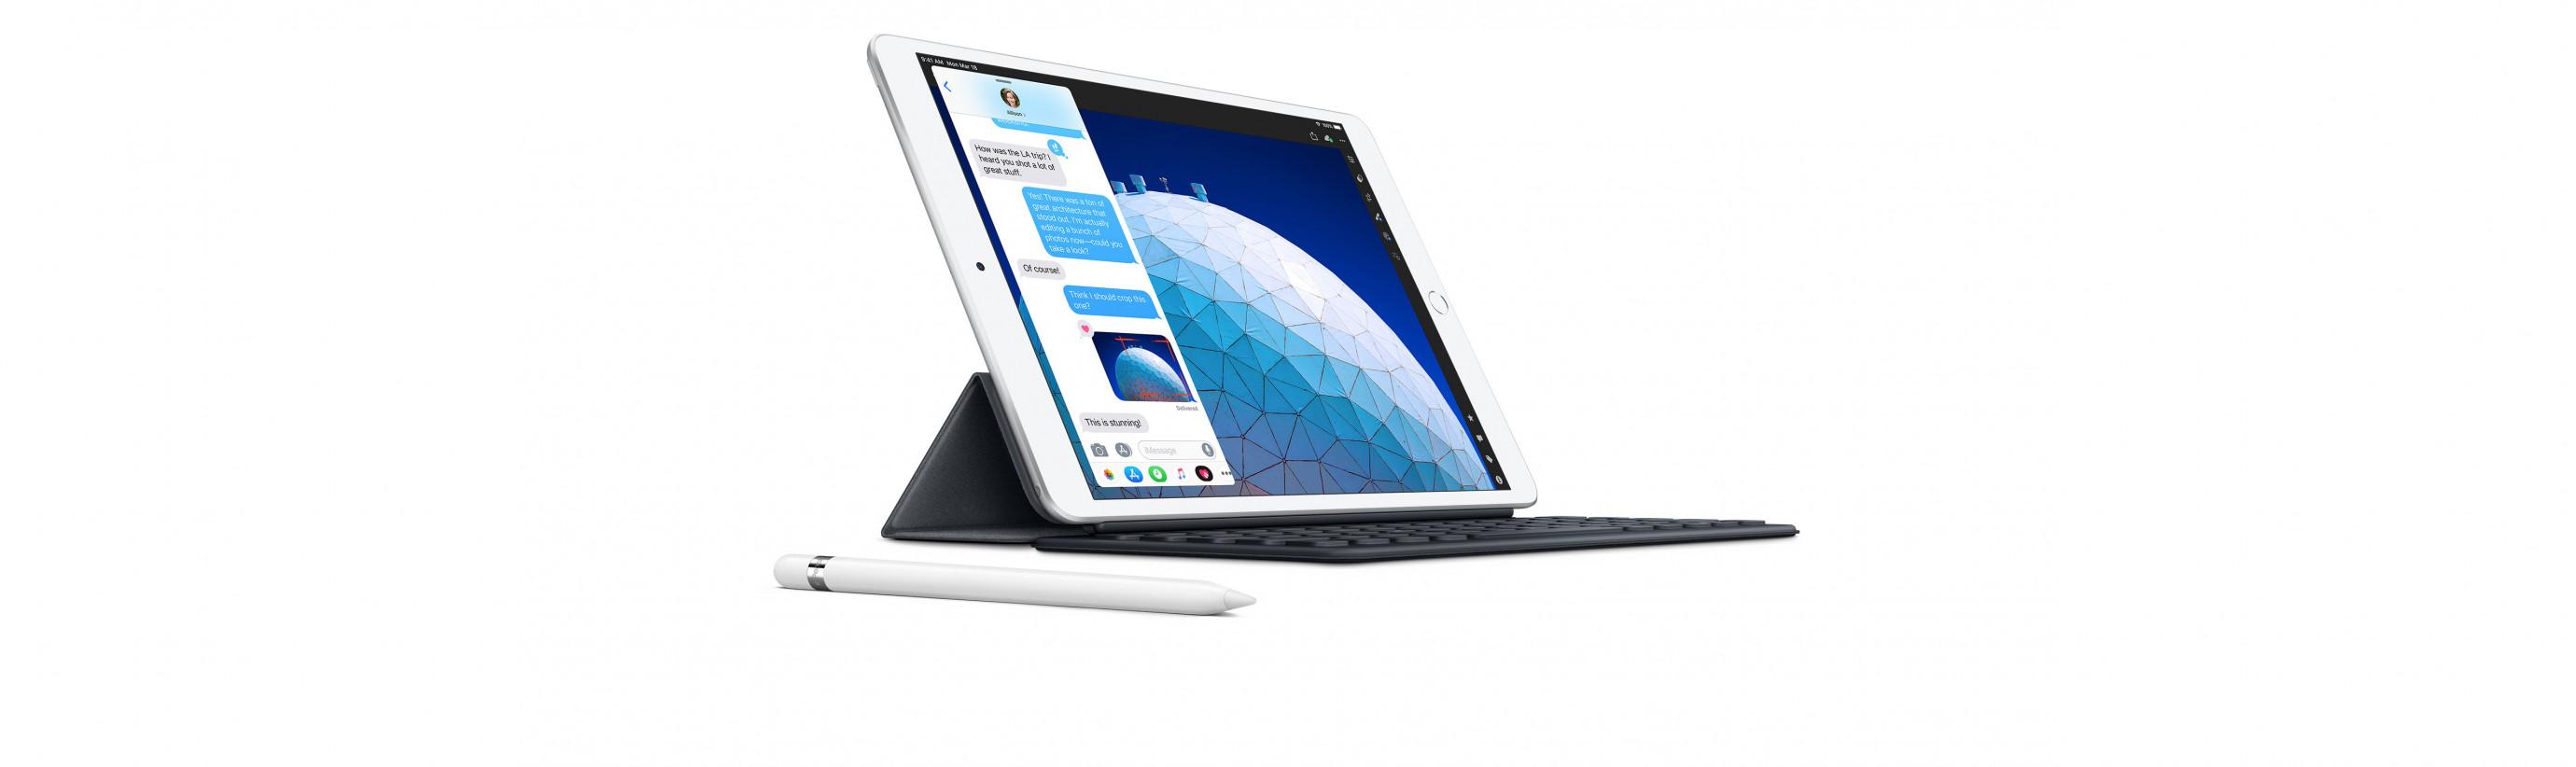 Productpage---iPad-Air-2019-nl_04.jpg